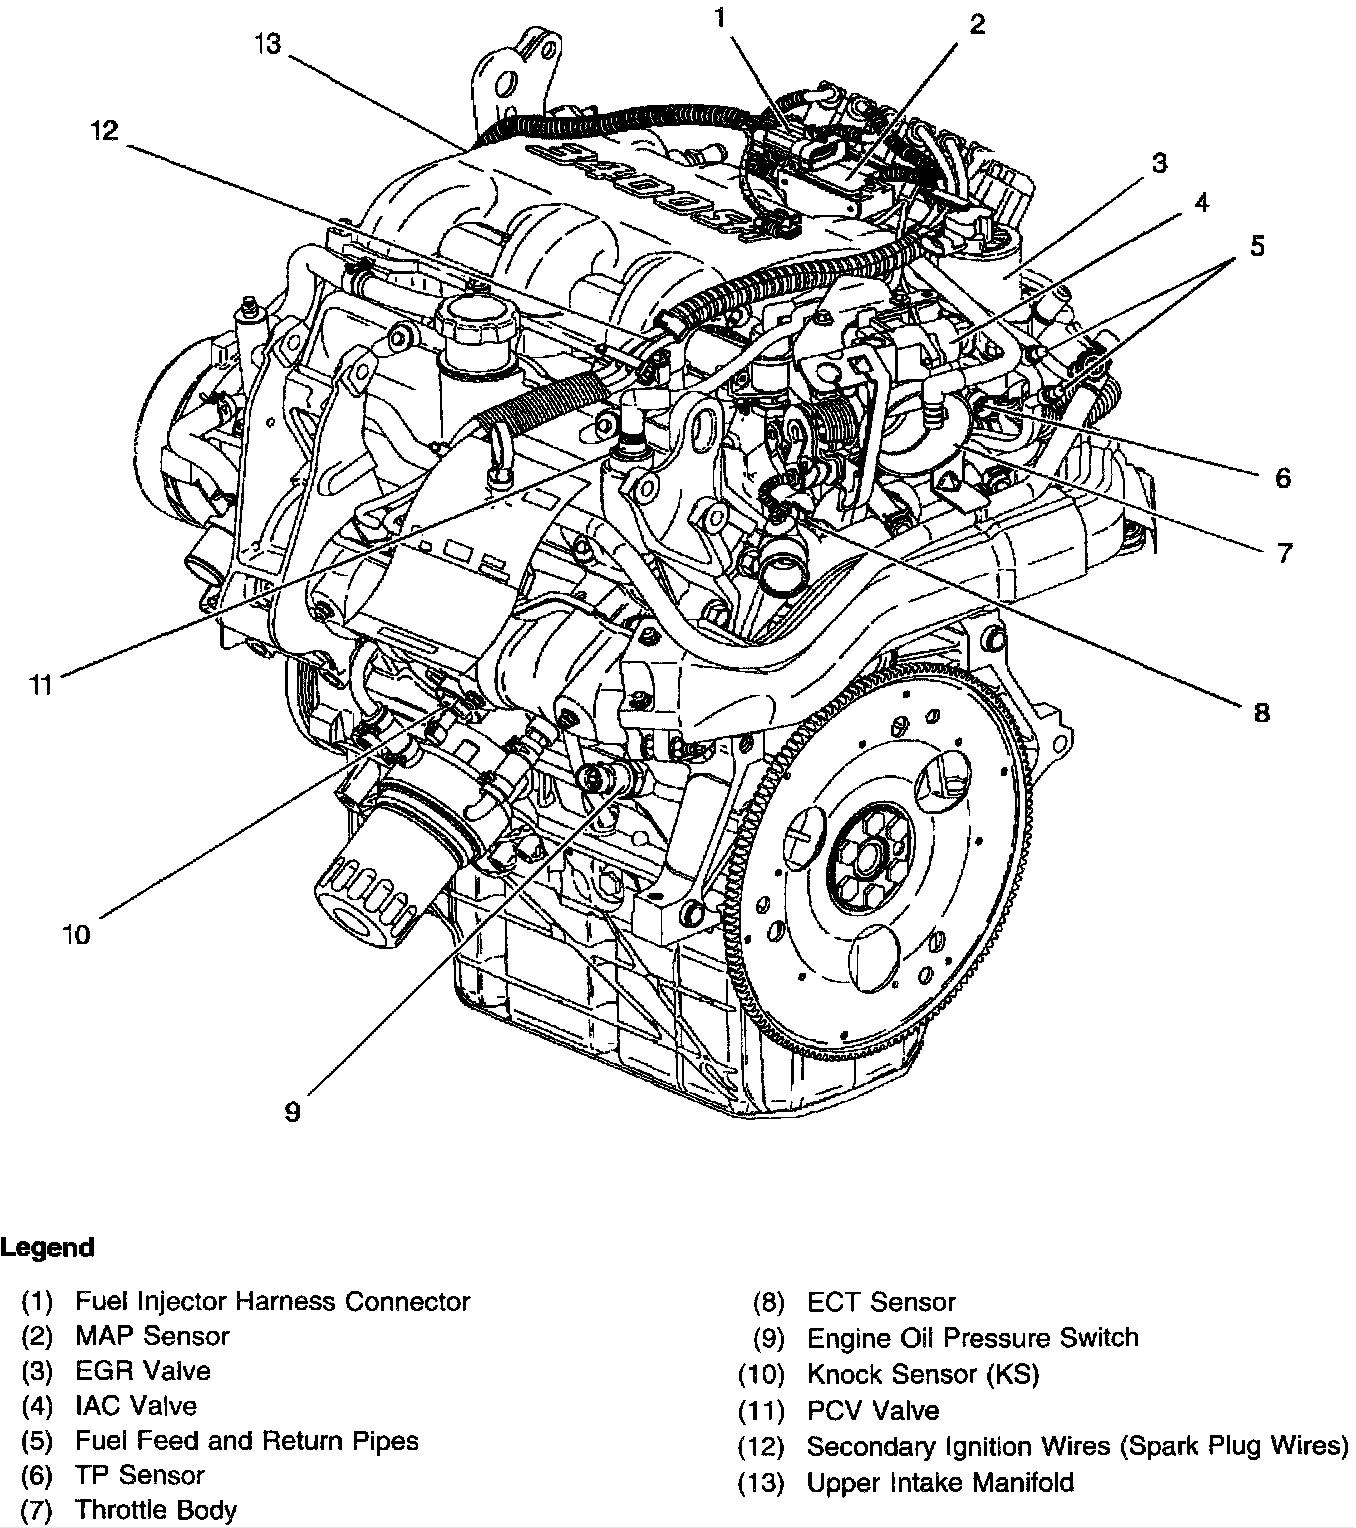 Chevy V6 Vortec Engine Diagram | Wiring Library - Spark Plug Wiring Diagram Chevy 4.3 V6